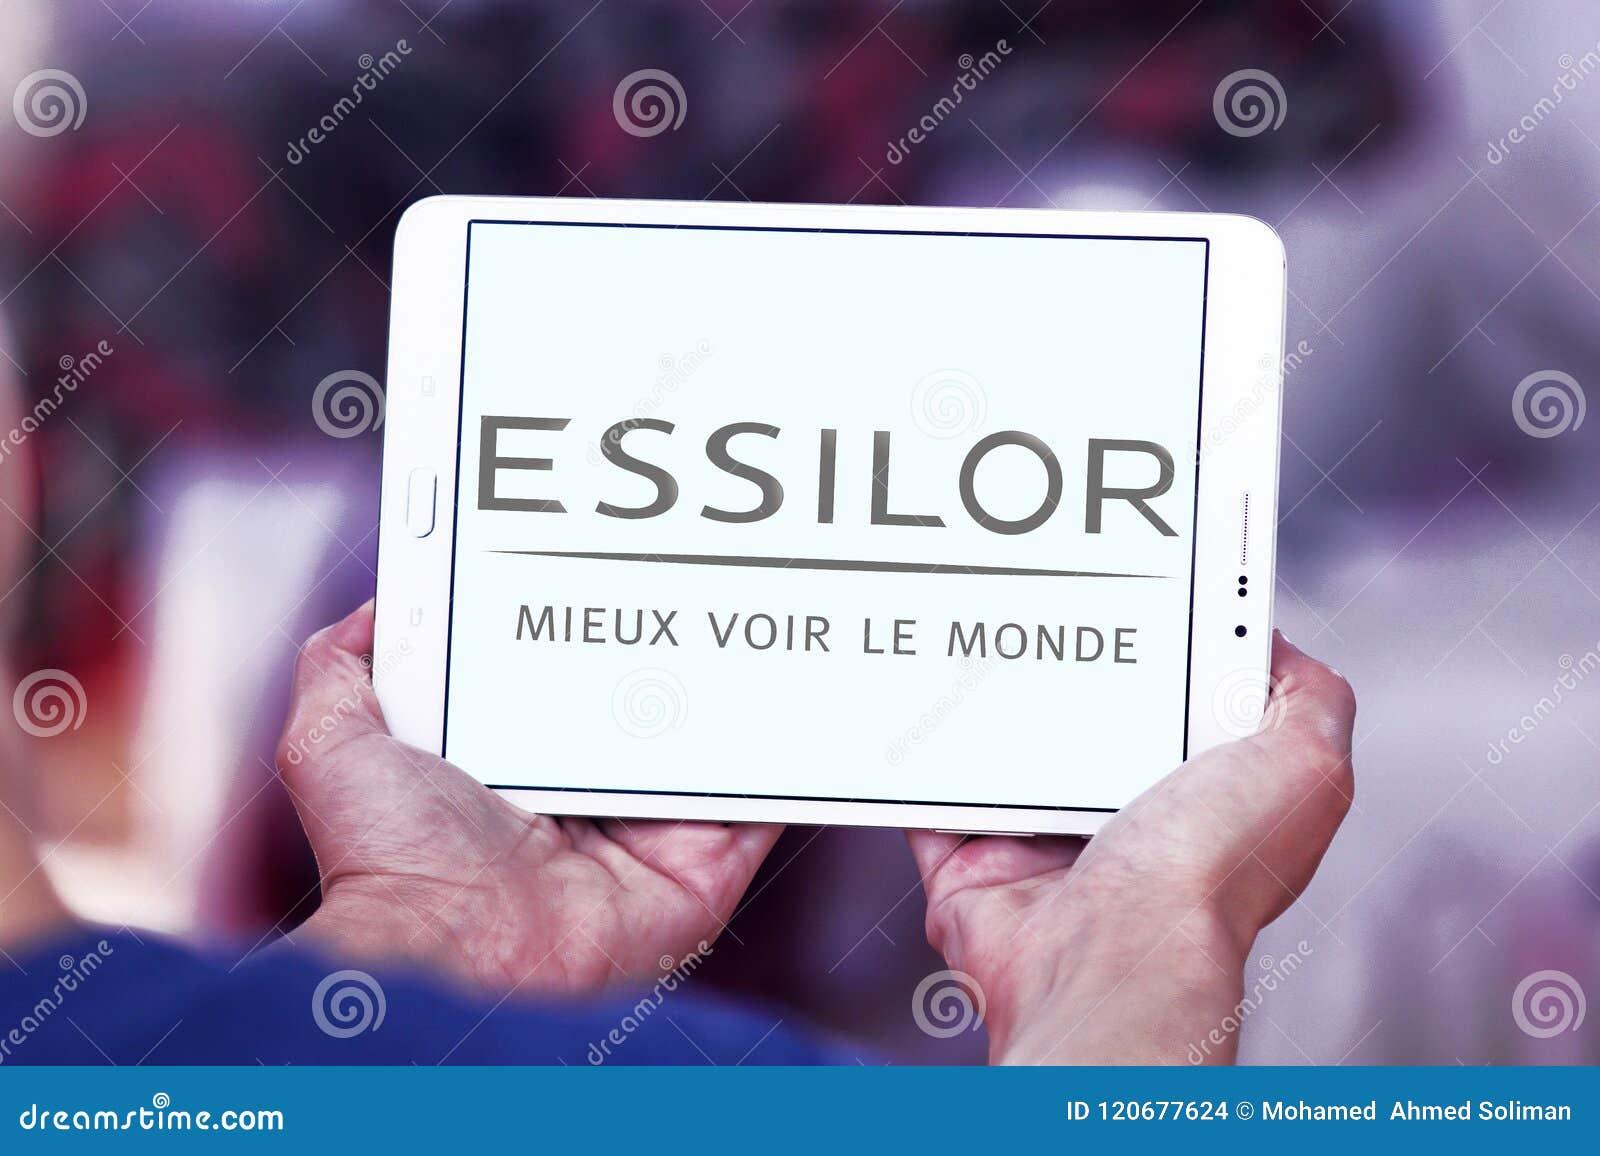 Essilor Optics Company Logo Editorial Stock Image - Image of